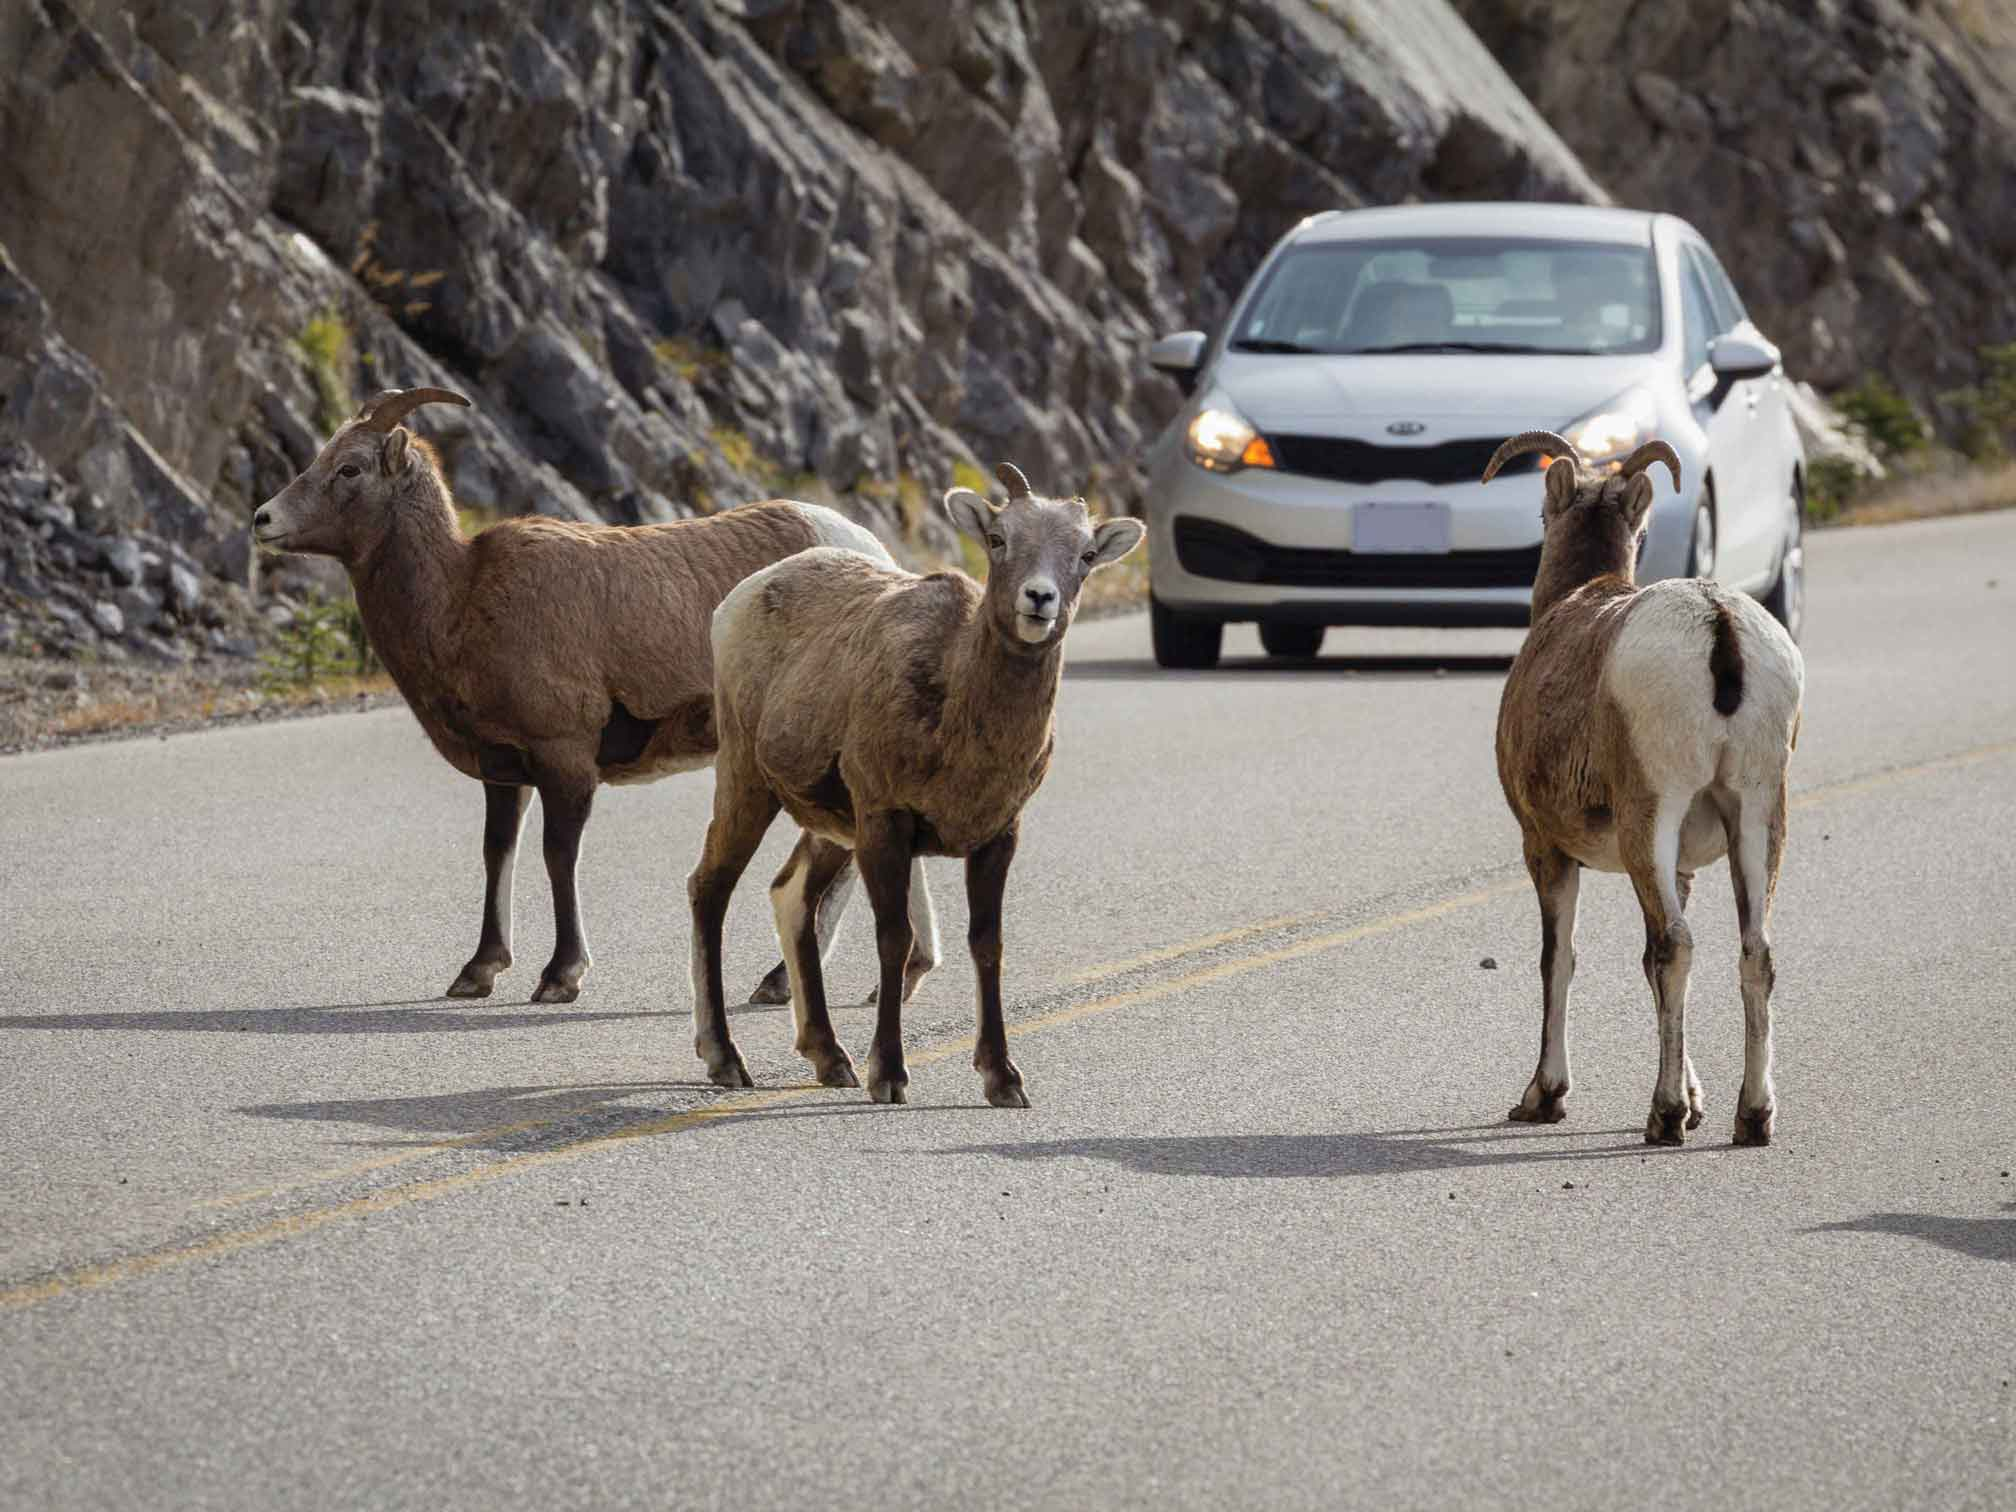 Parks Canada-Rogier Gruys, Blue Peak Travel Photography